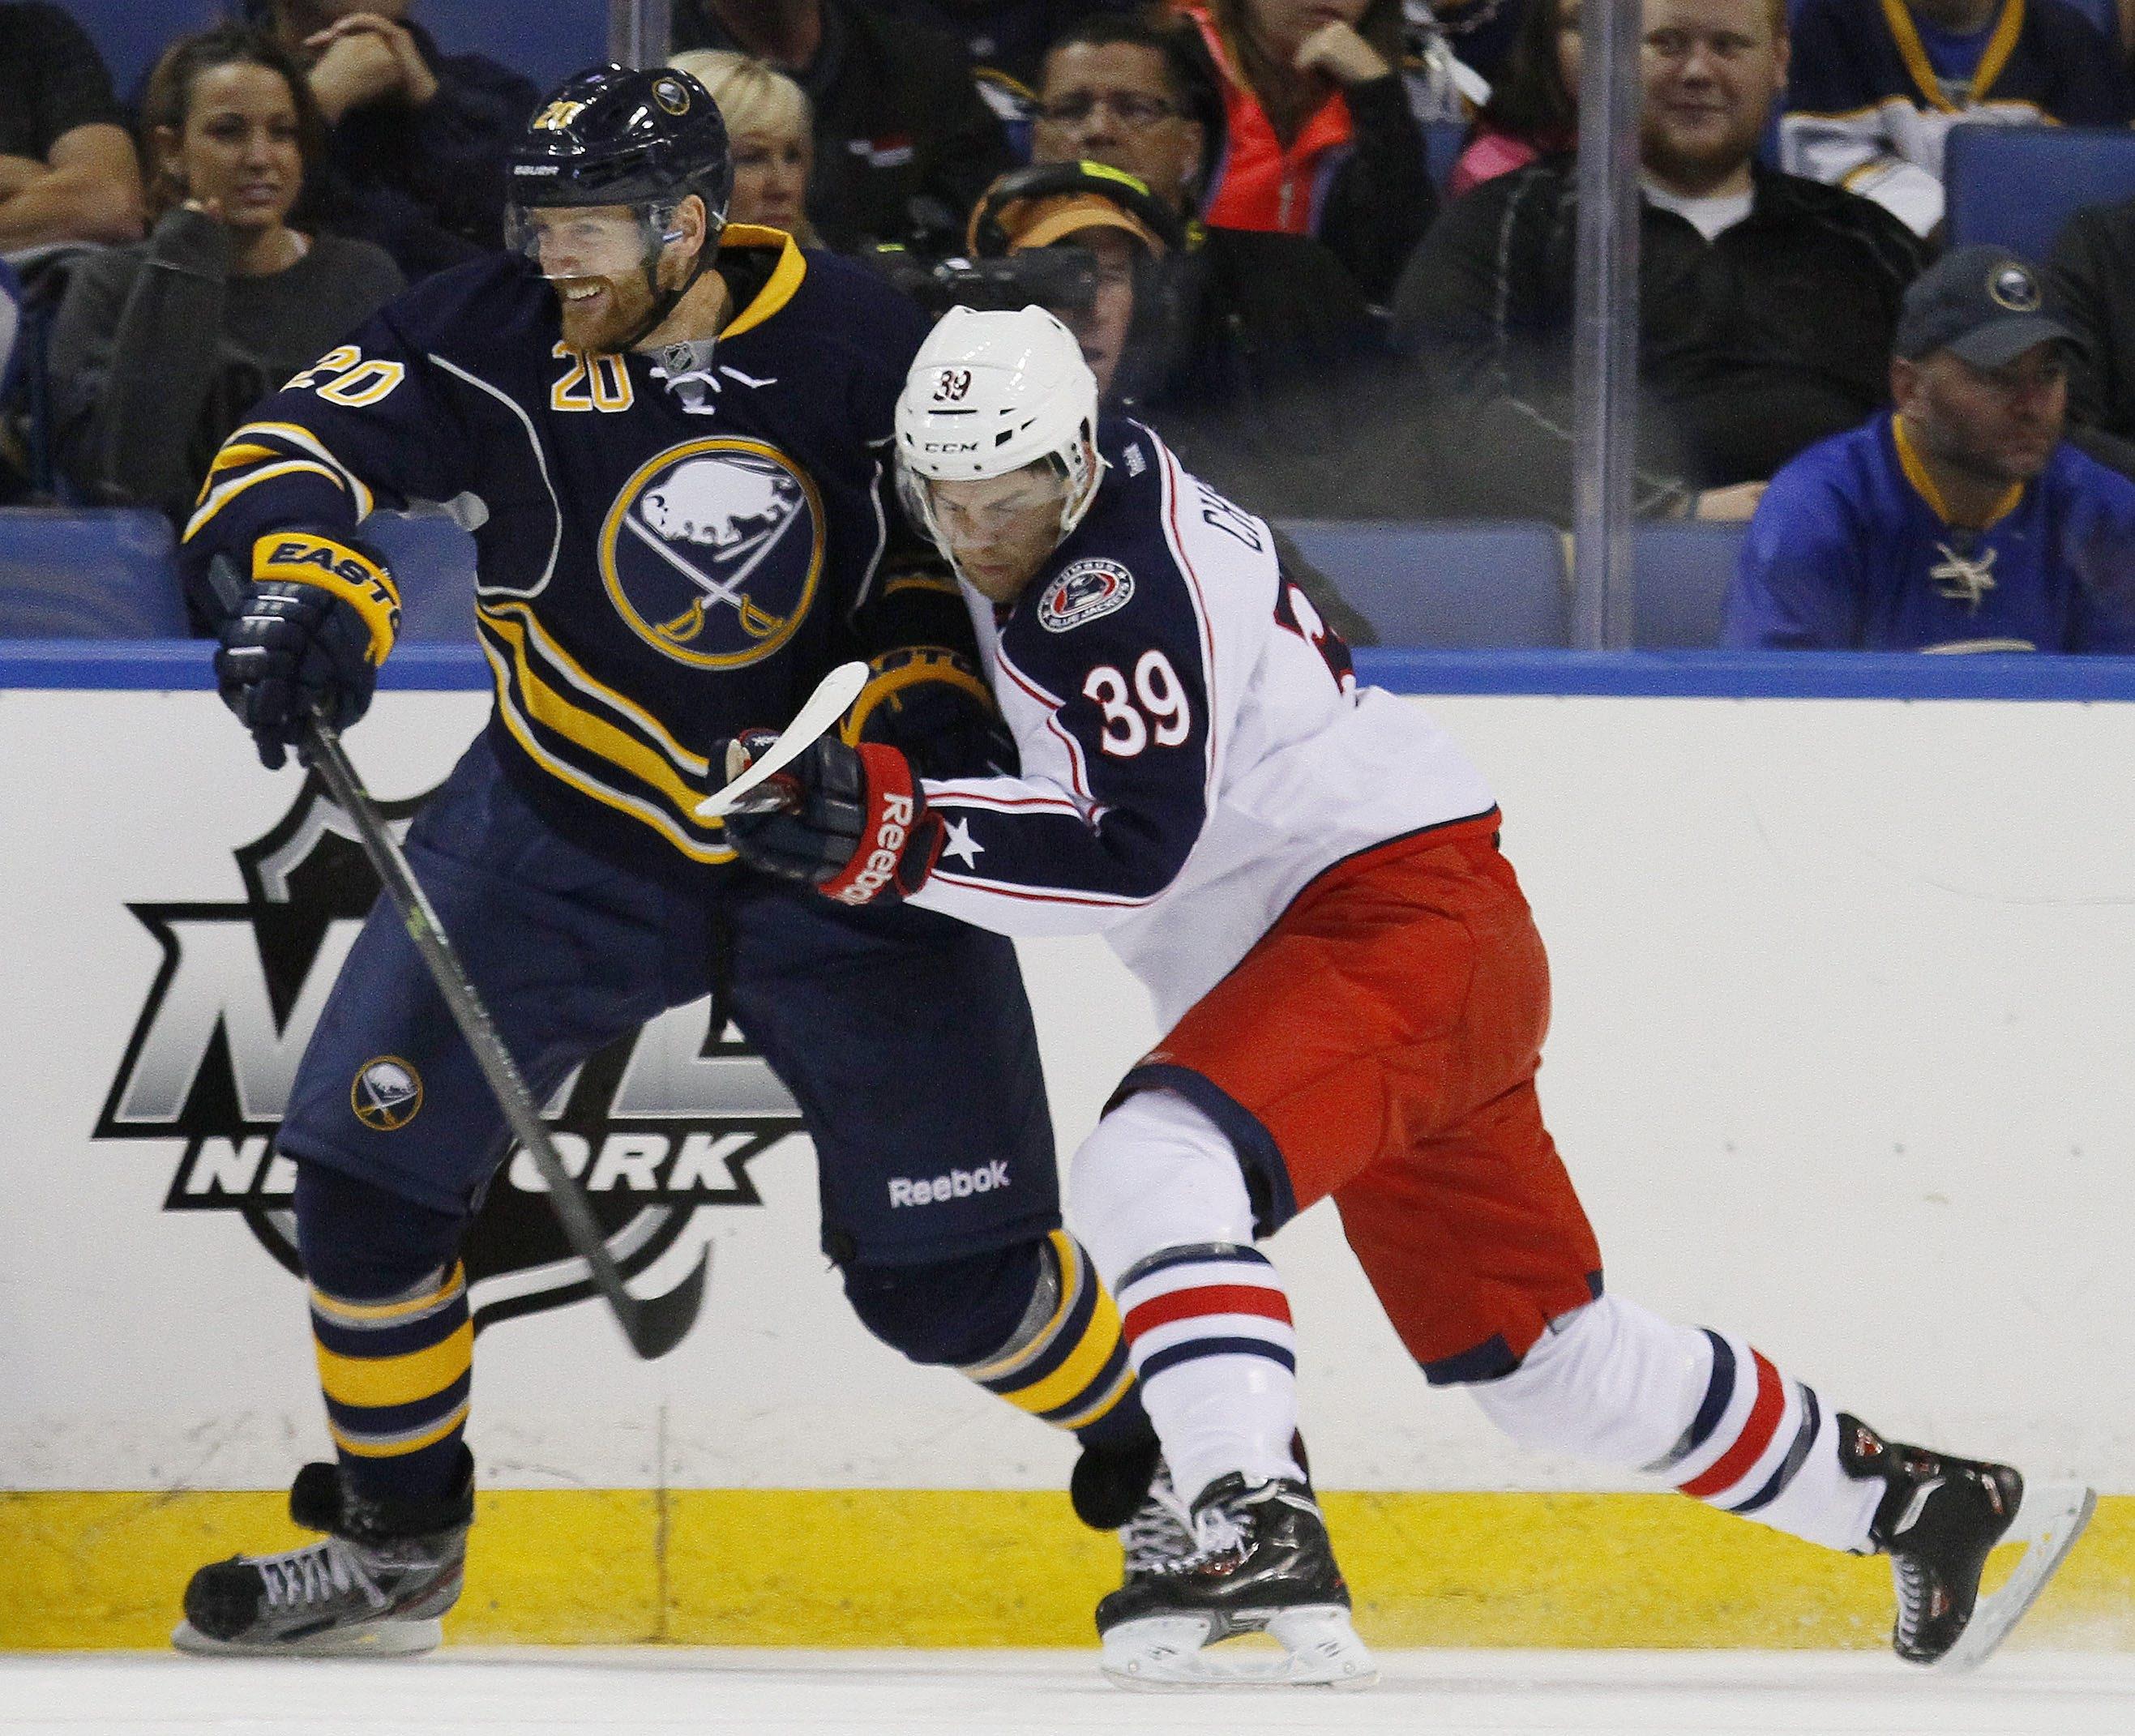 Buffalo's Henrik Tallinder battles Columbus' Michael Chaput along the boards during Wednesday night's game.